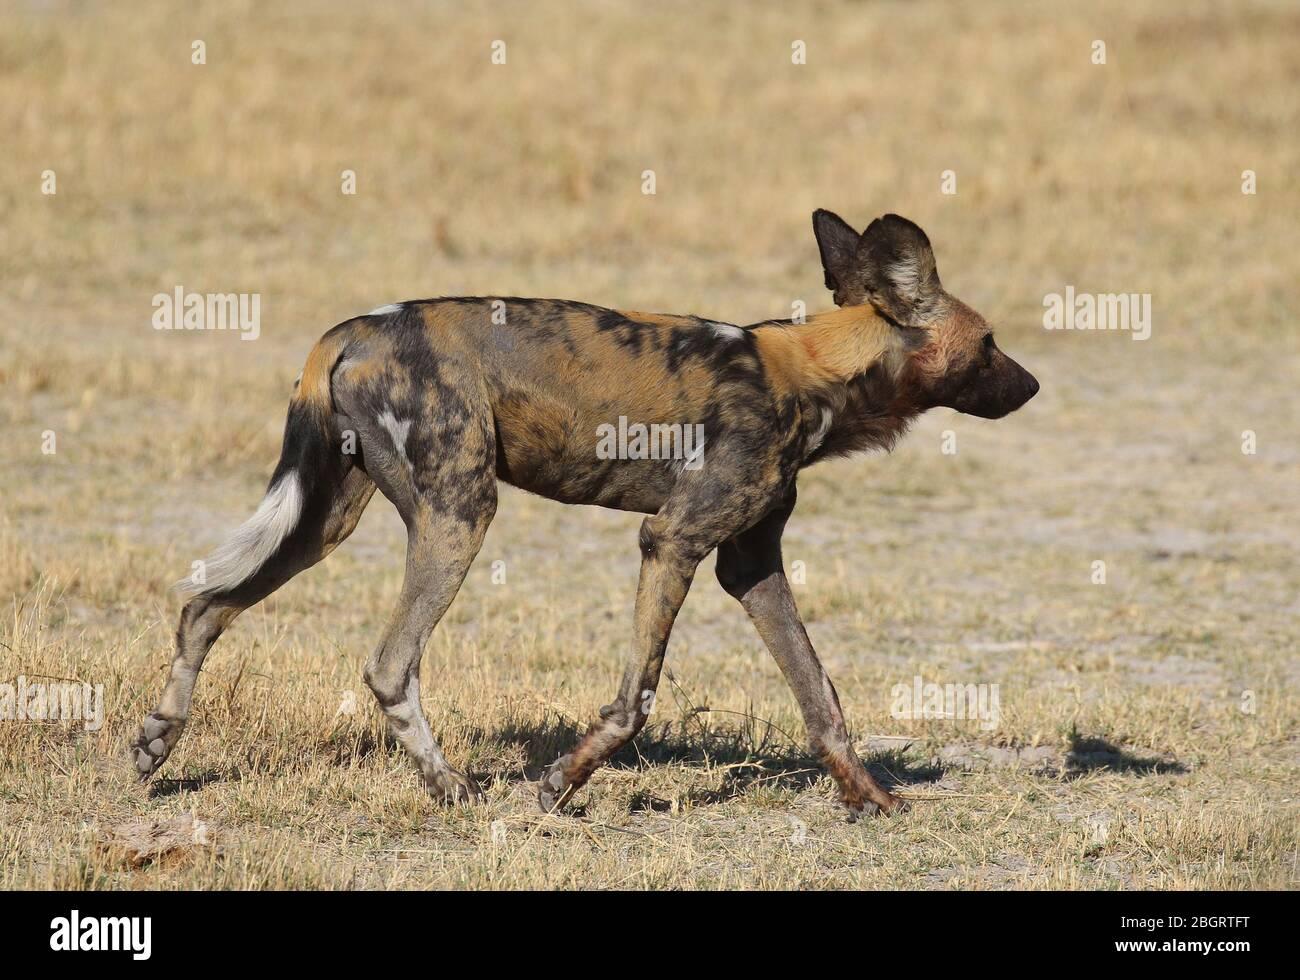 Botswana Painted dogs Stock Photo